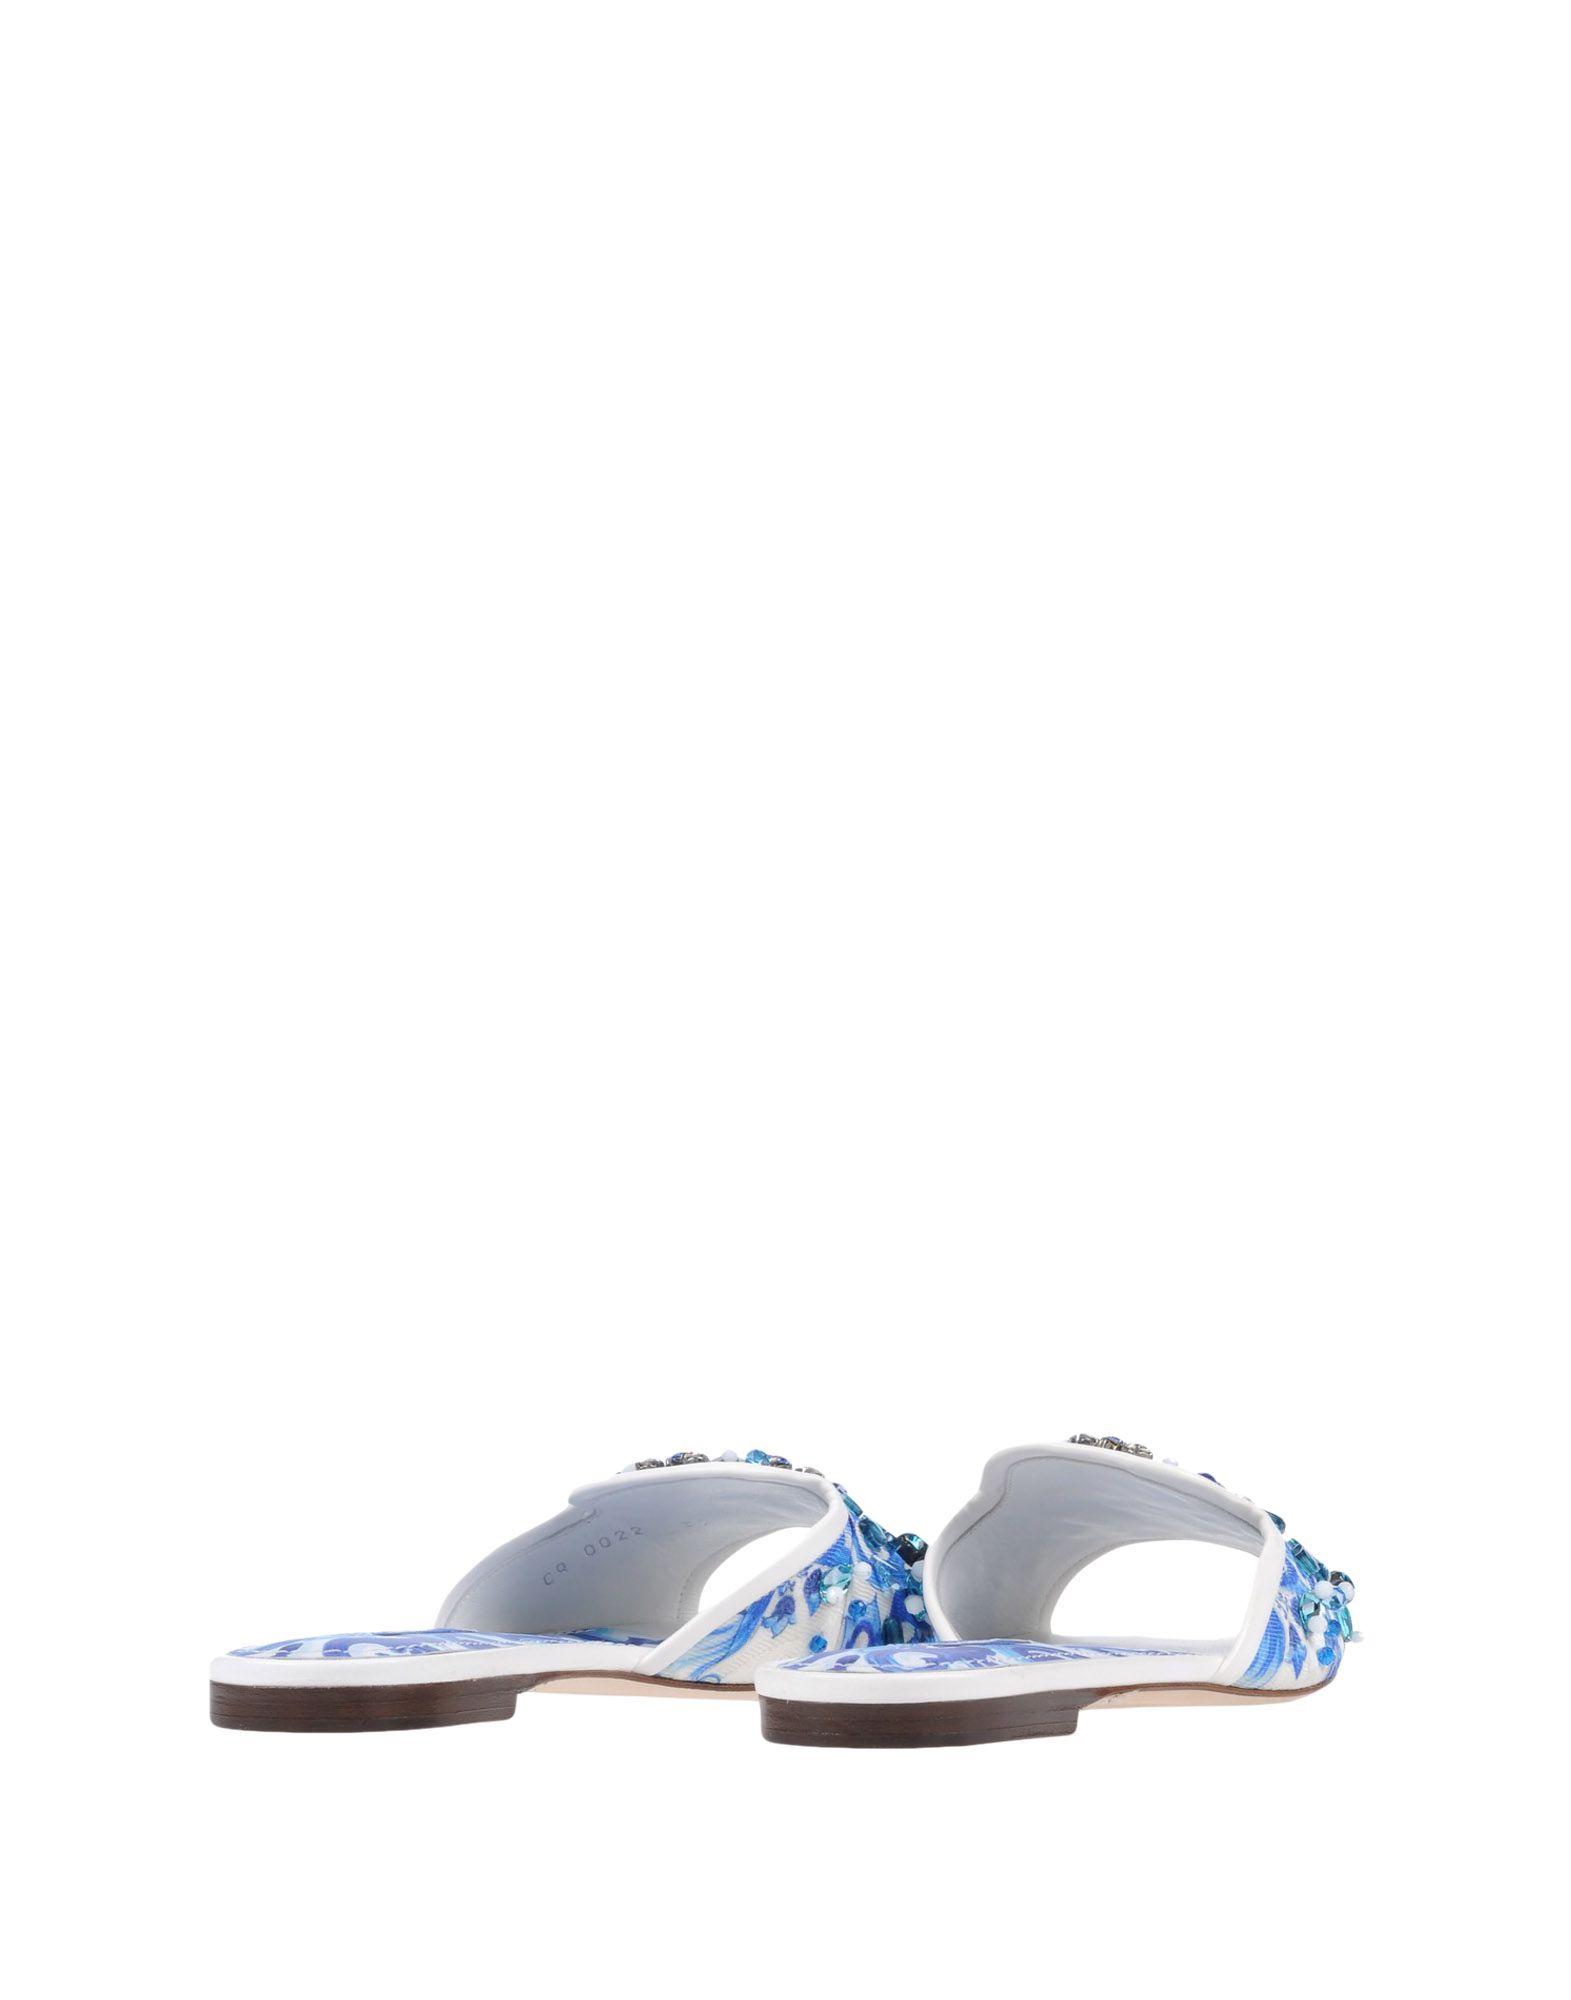 Dolce & Gabbana Sandalen Damen Schuhe  11473172CRGünstige gut aussehende Schuhe Damen fbb87b